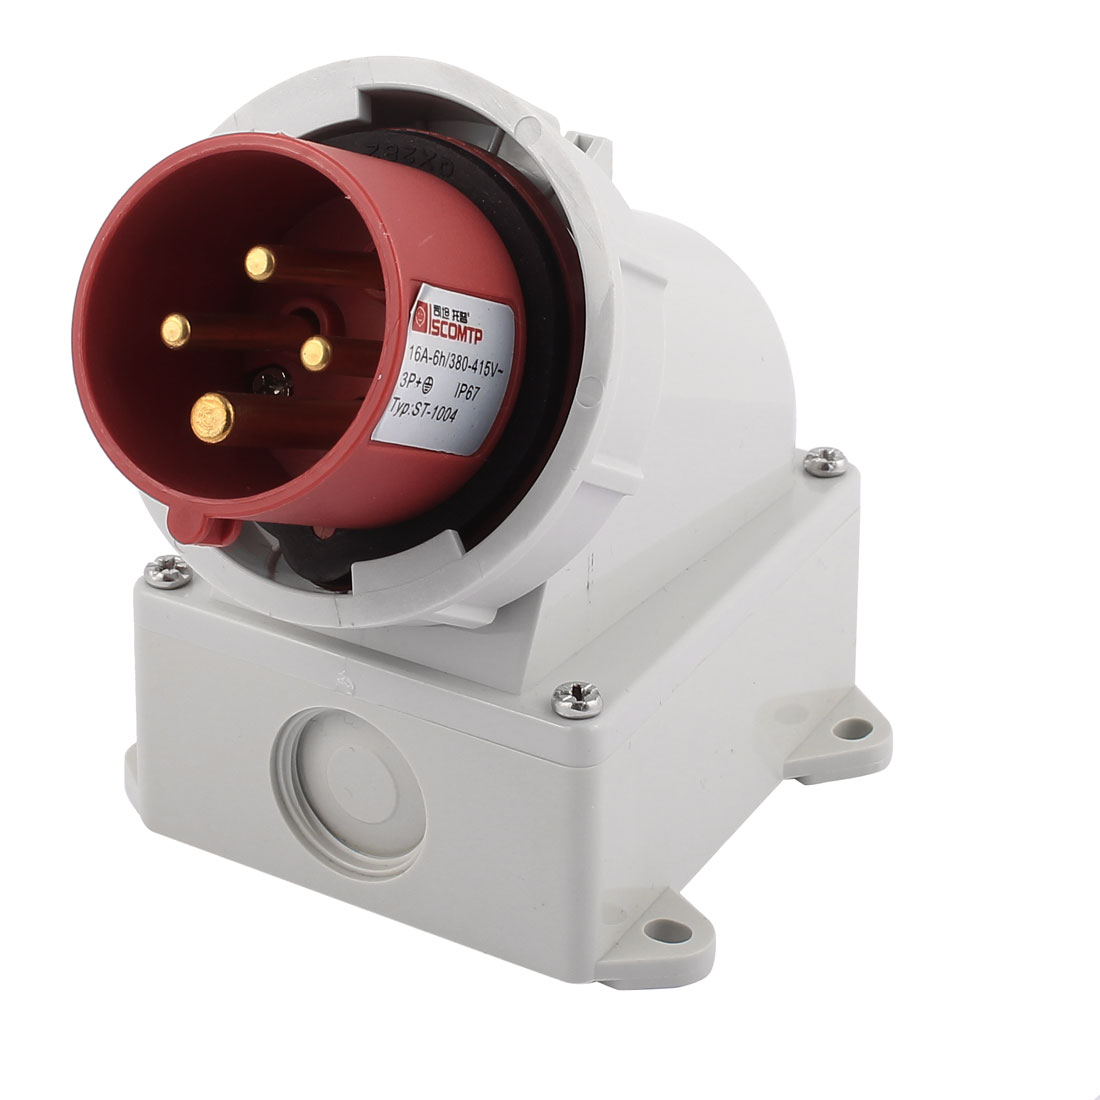 AC 380V-415V 16A IP67 3P+E 4-Terminal Male Industrial Caravan Plug